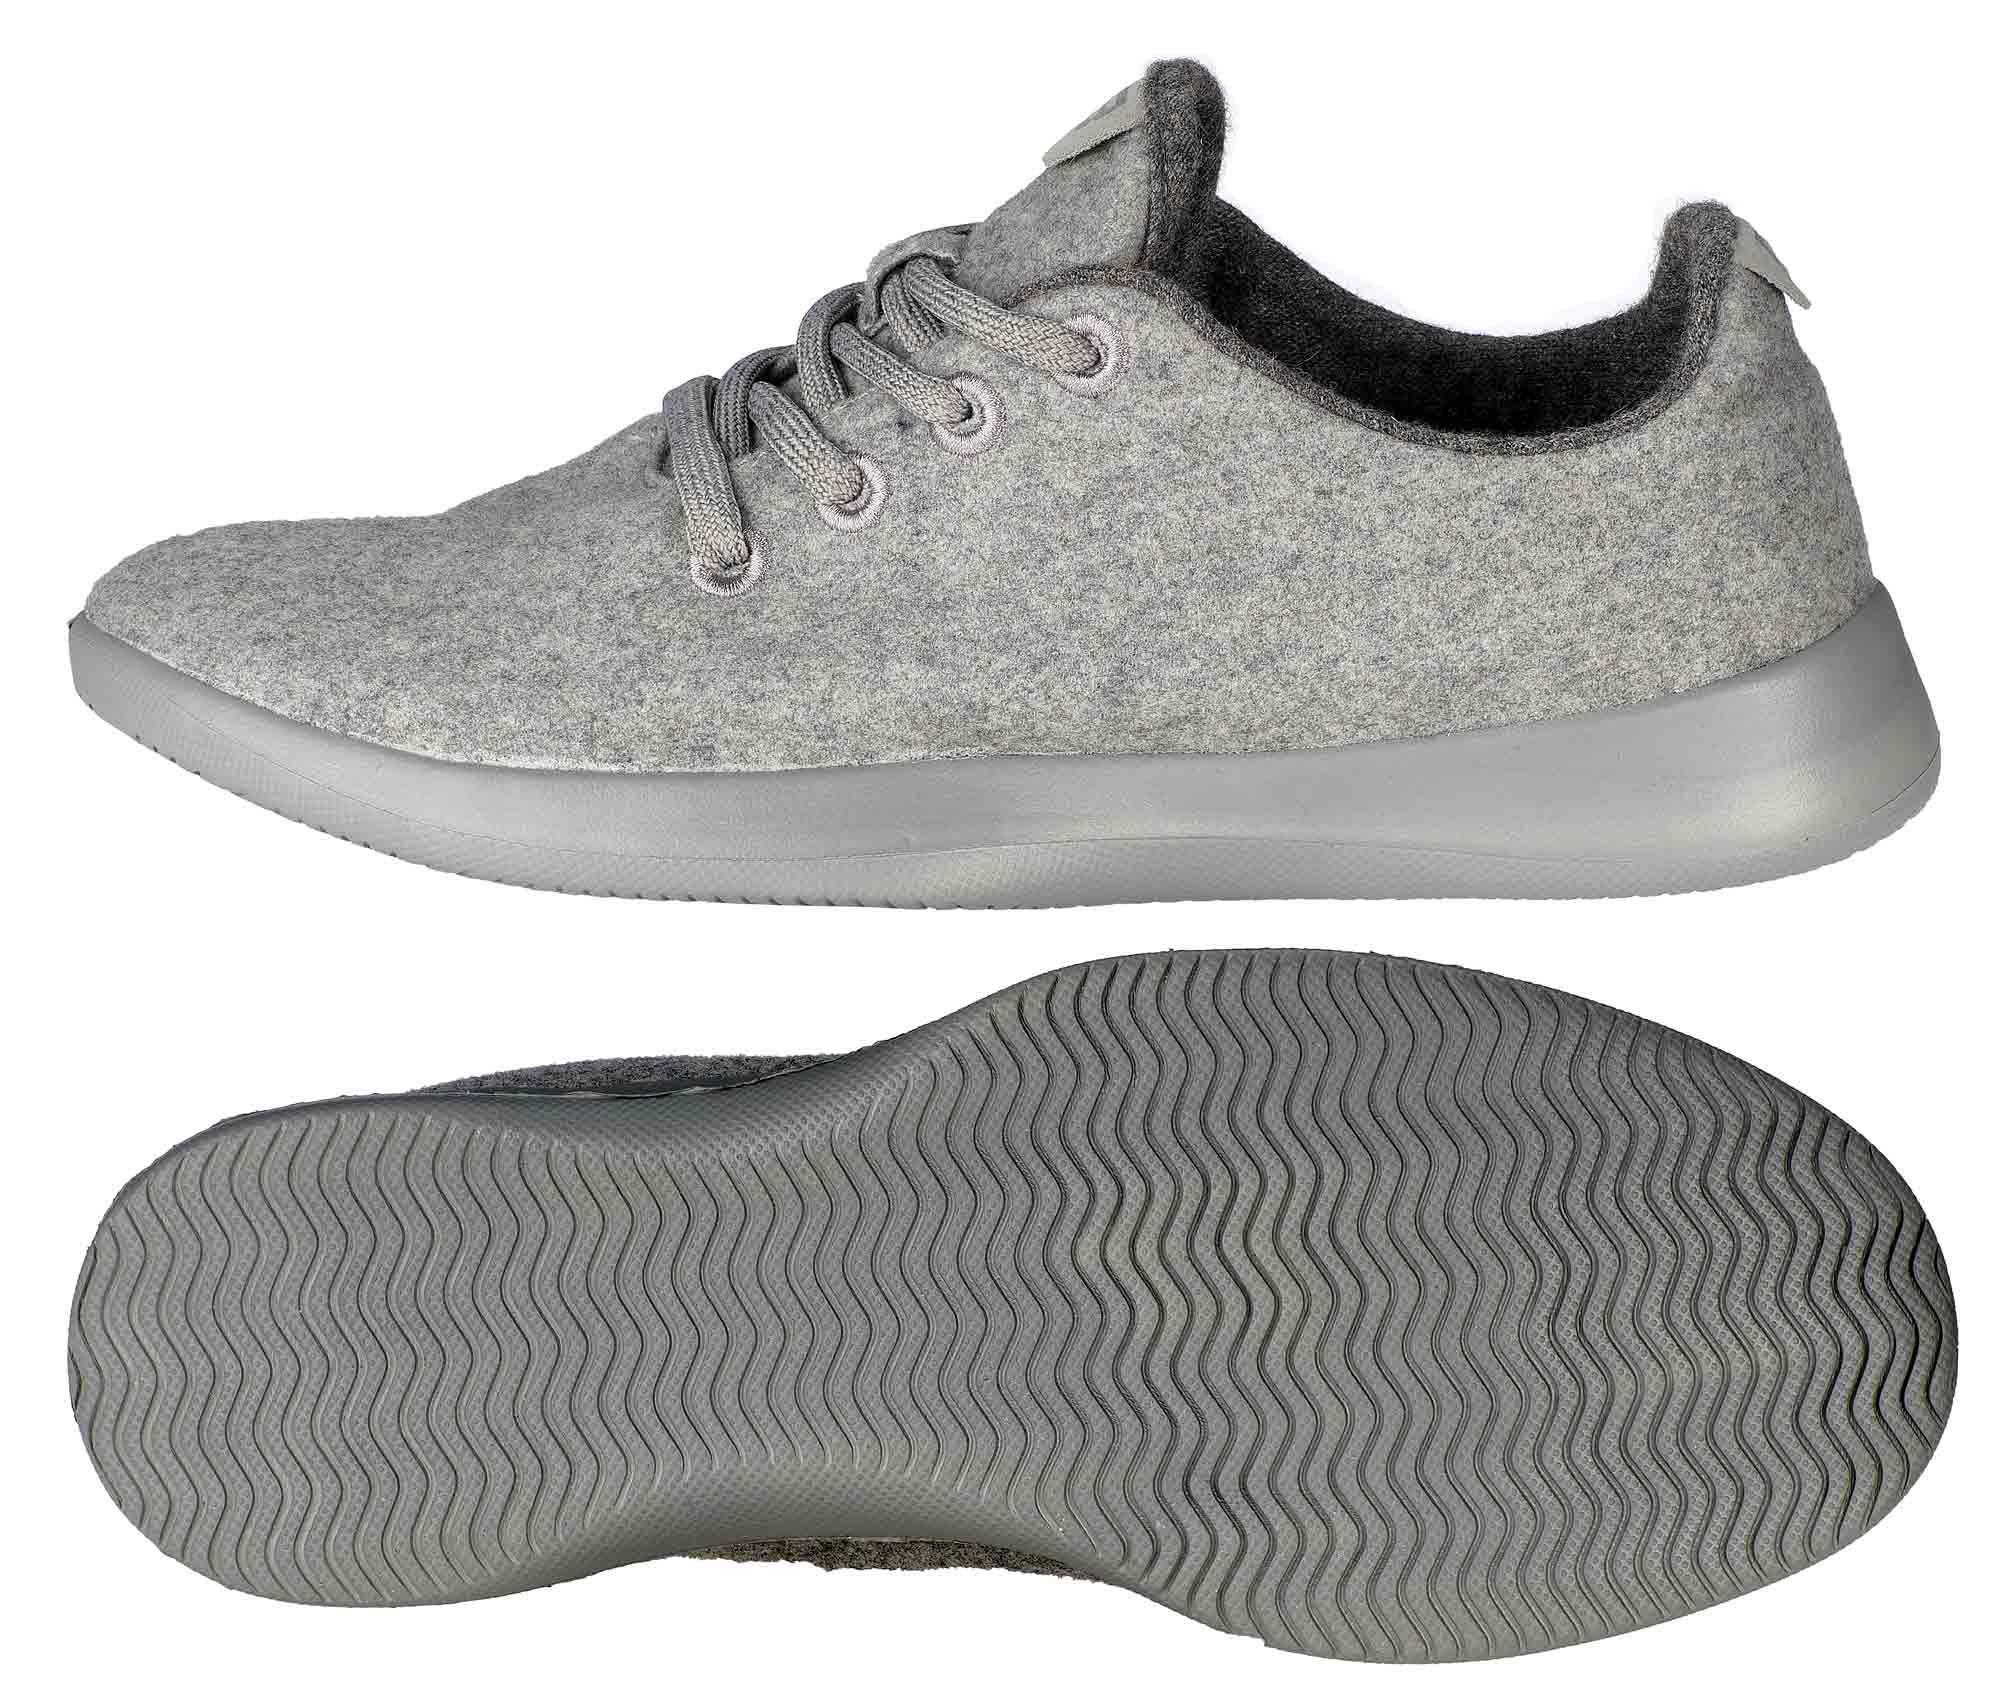 Ballop Sneaker Tenderness grau Wanderschuhe Wandern Sportarten Unisex